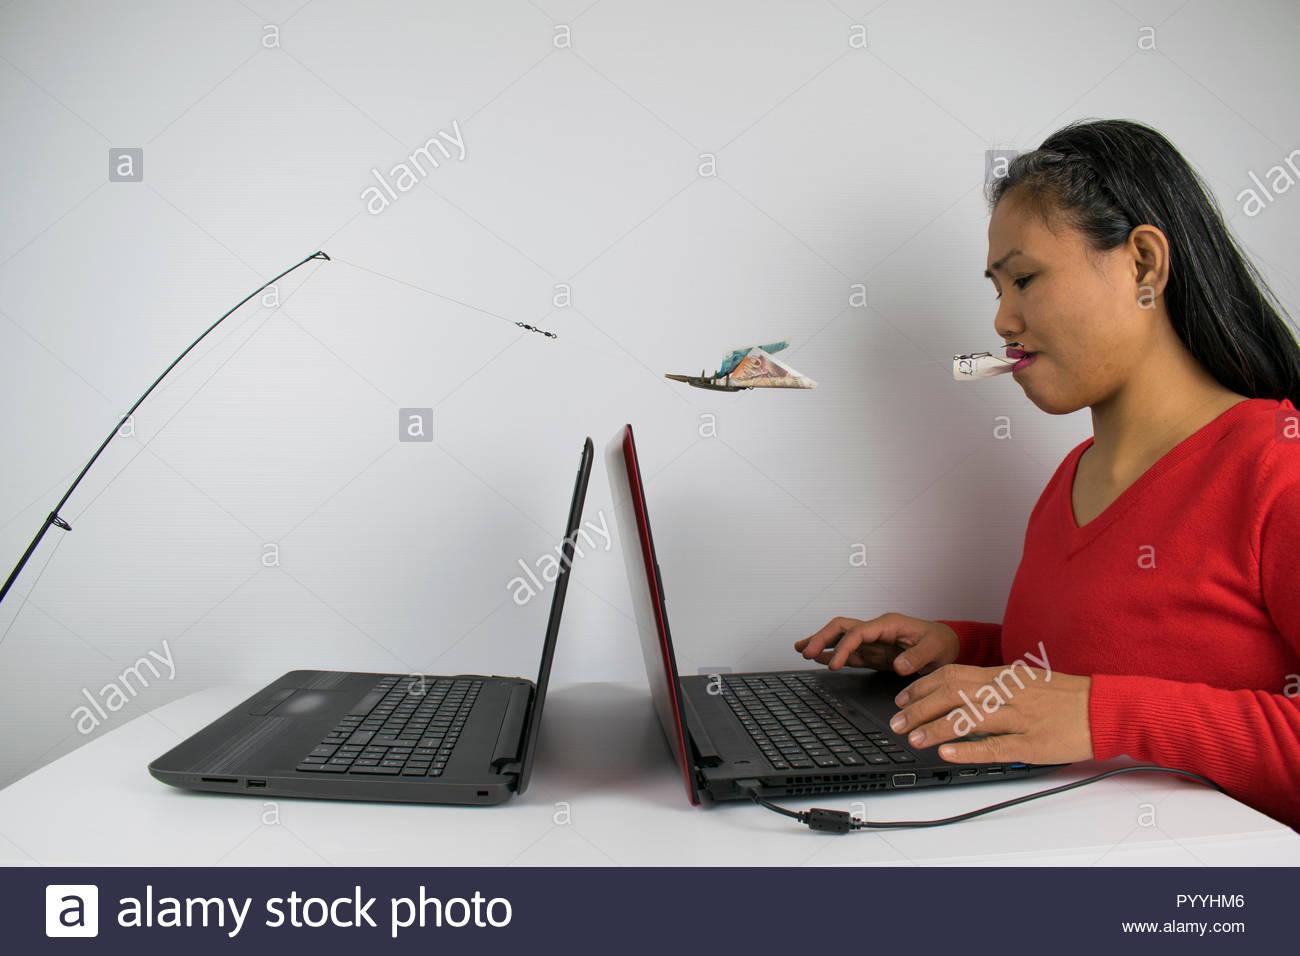 Fotografía retratando un concepto de phishing usando modelo femenino, Portátil, caña de pescar, Línea, alimentador y gancho Imagen De Stock